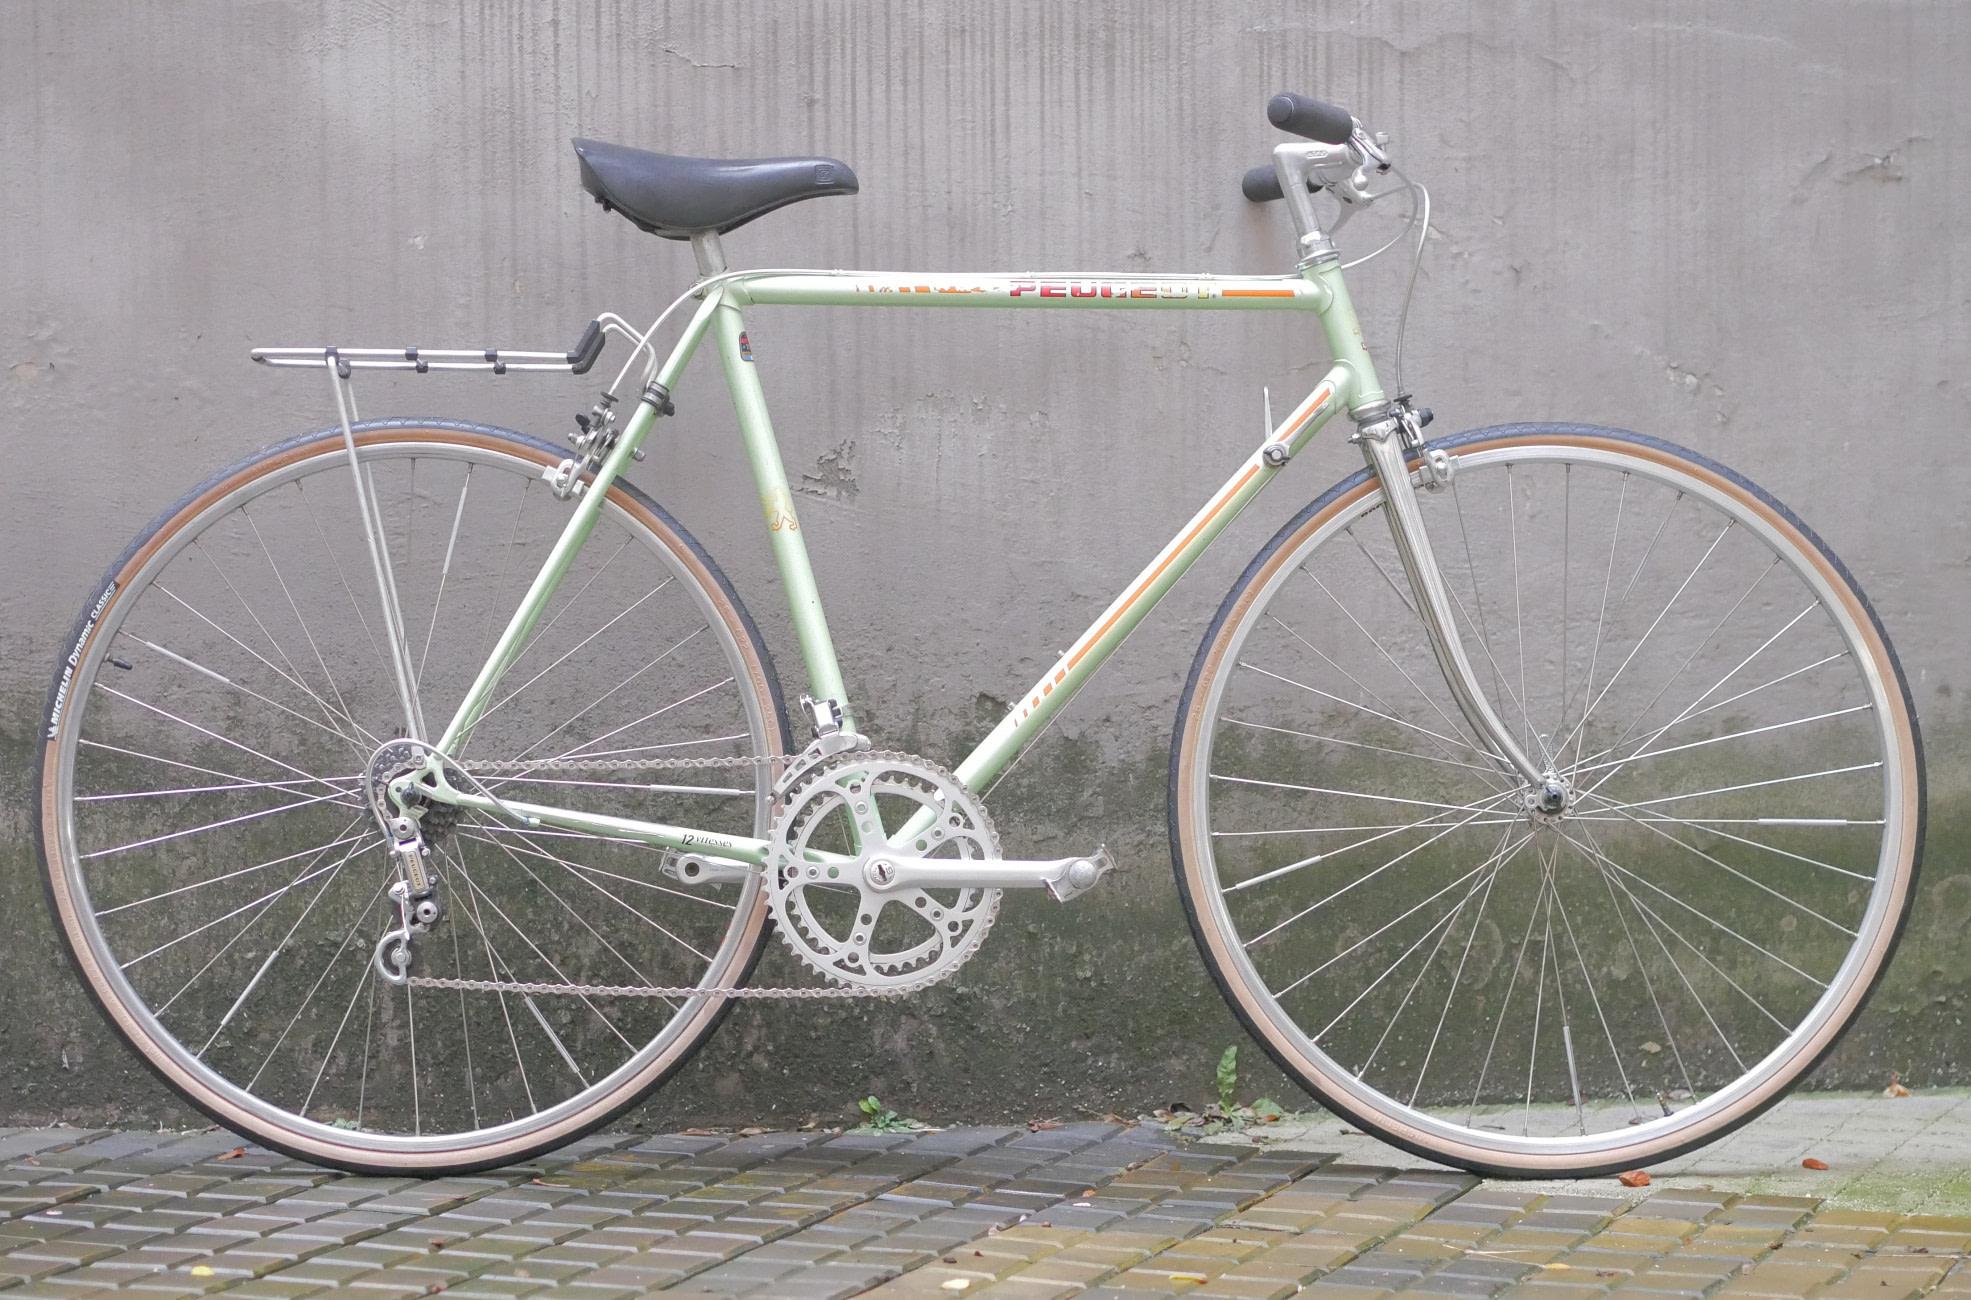 P1090026 e1557149036200 - SHOWROOM - custom bikes - neubau - vintage bikes